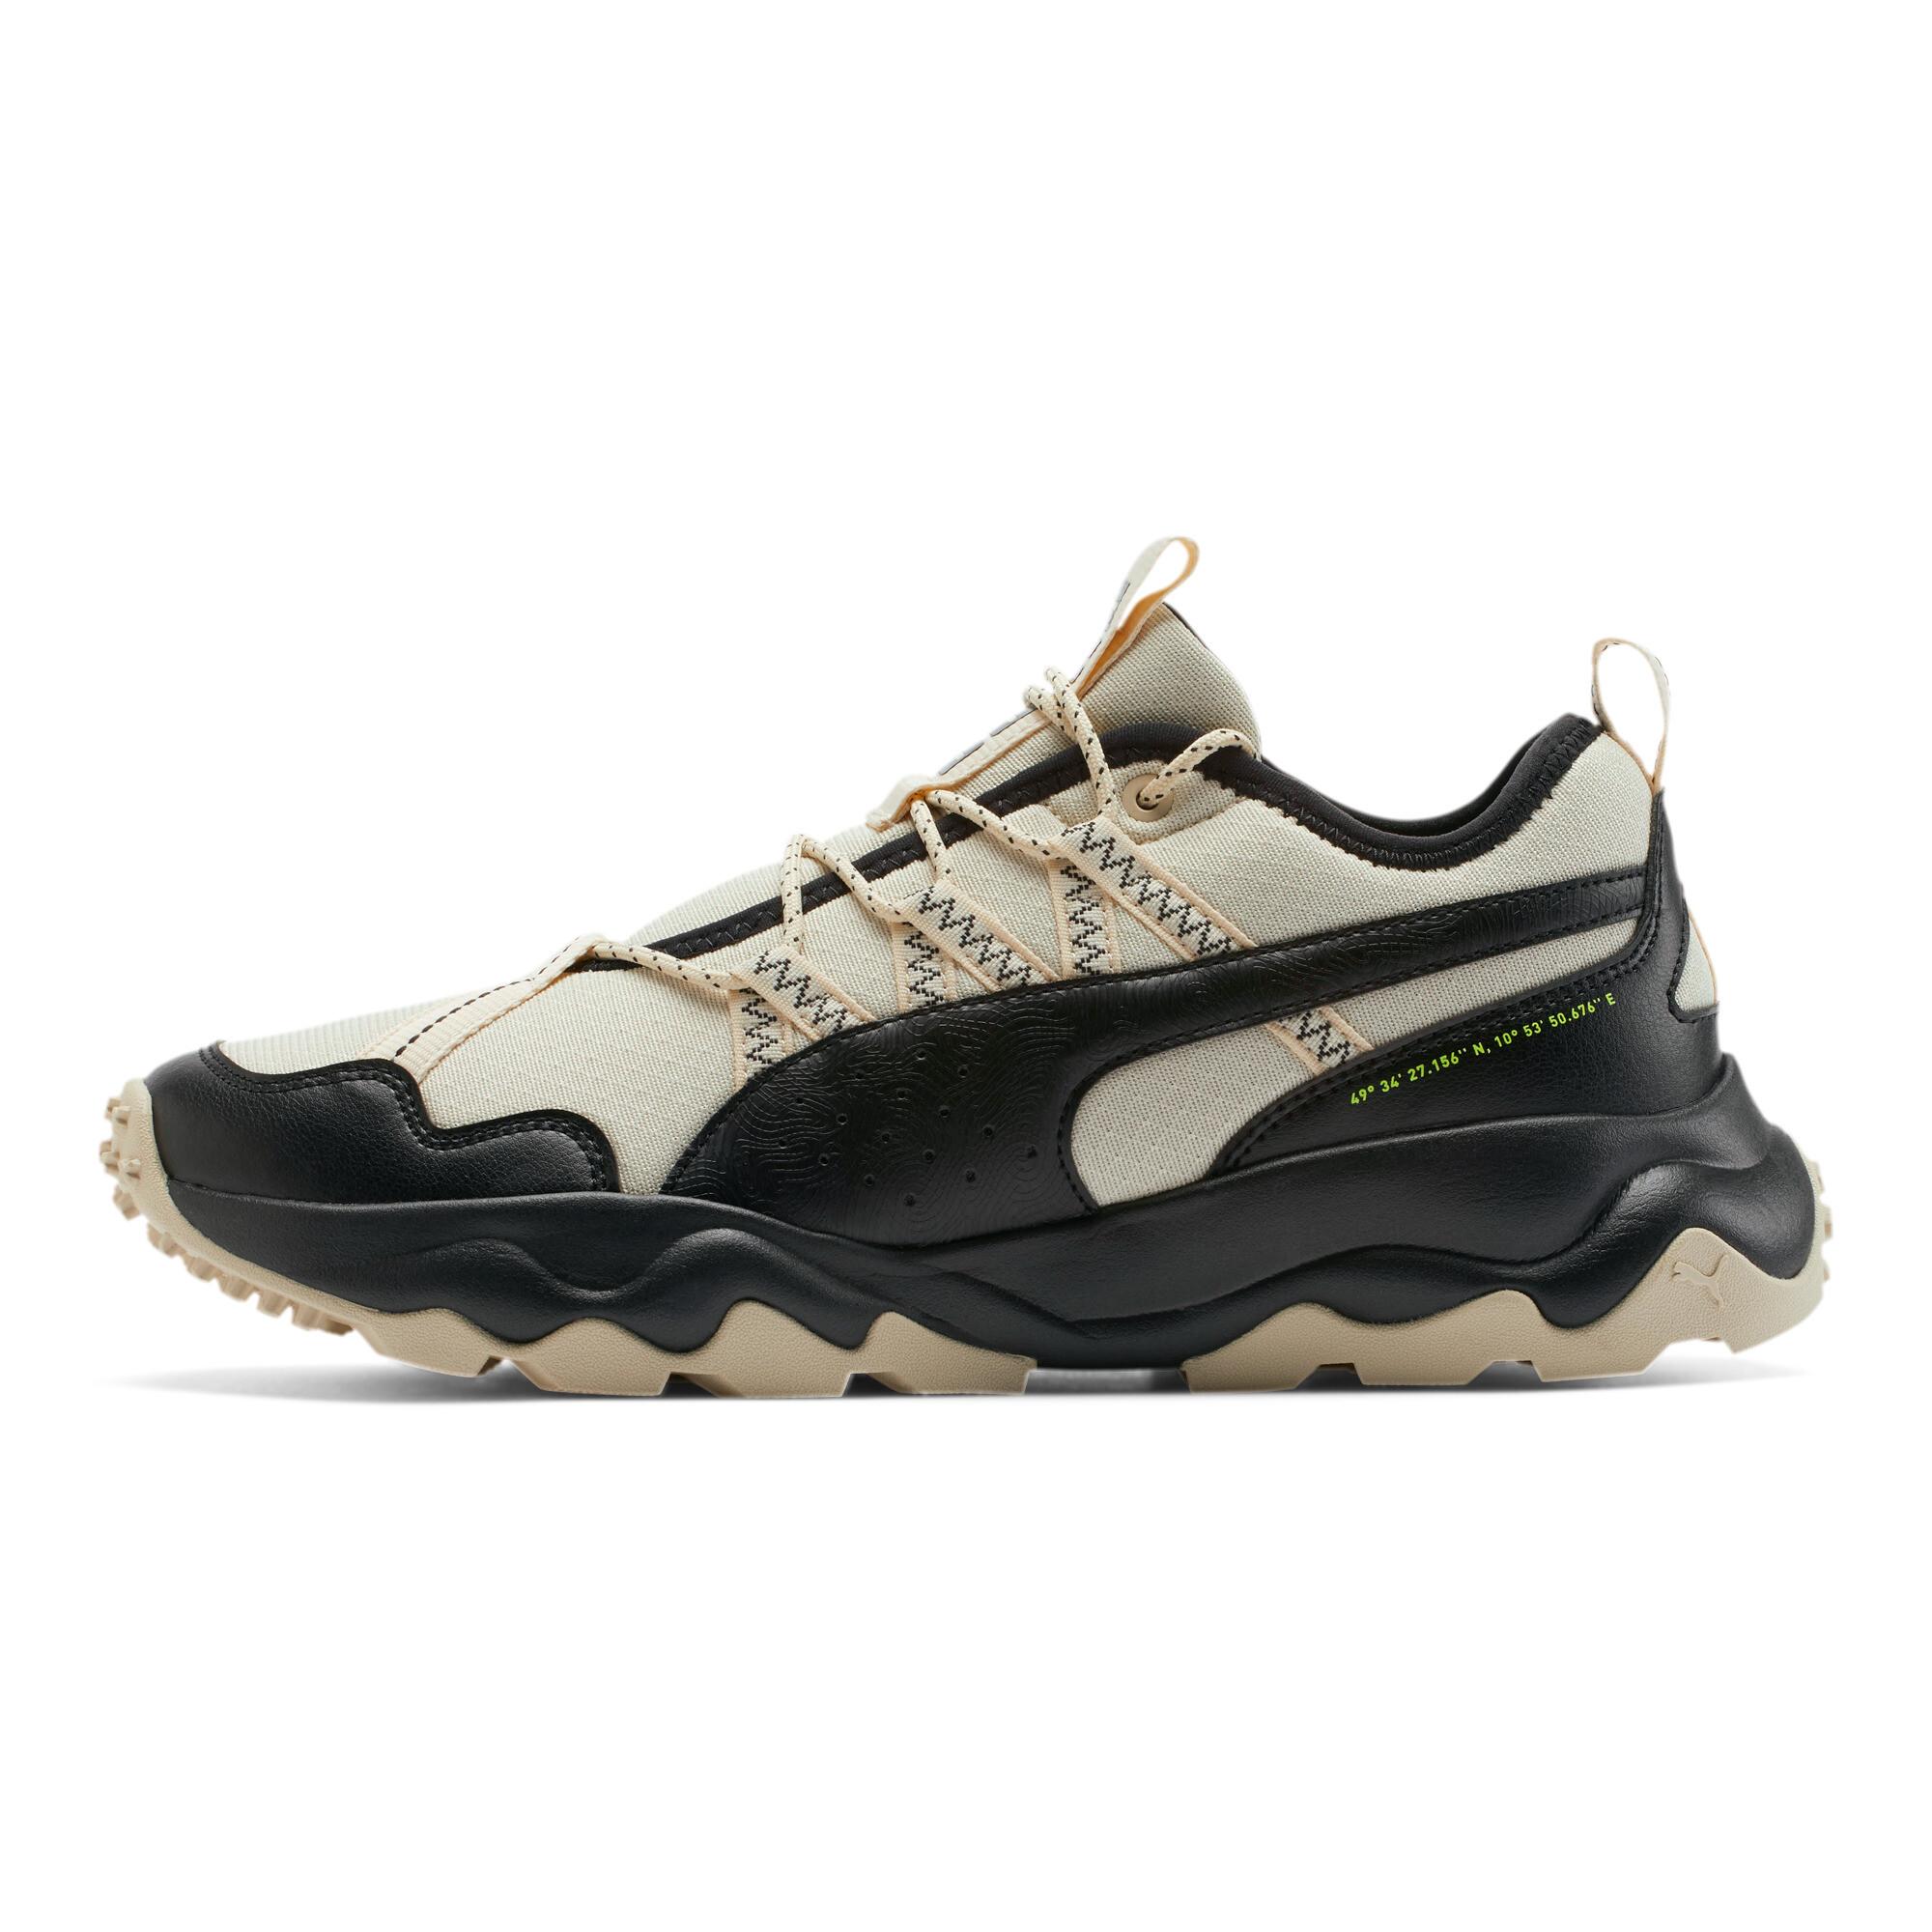 PUMA-Ember-Trail-Men-s-Running-Shoes-Men-Shoe-Running thumbnail 16